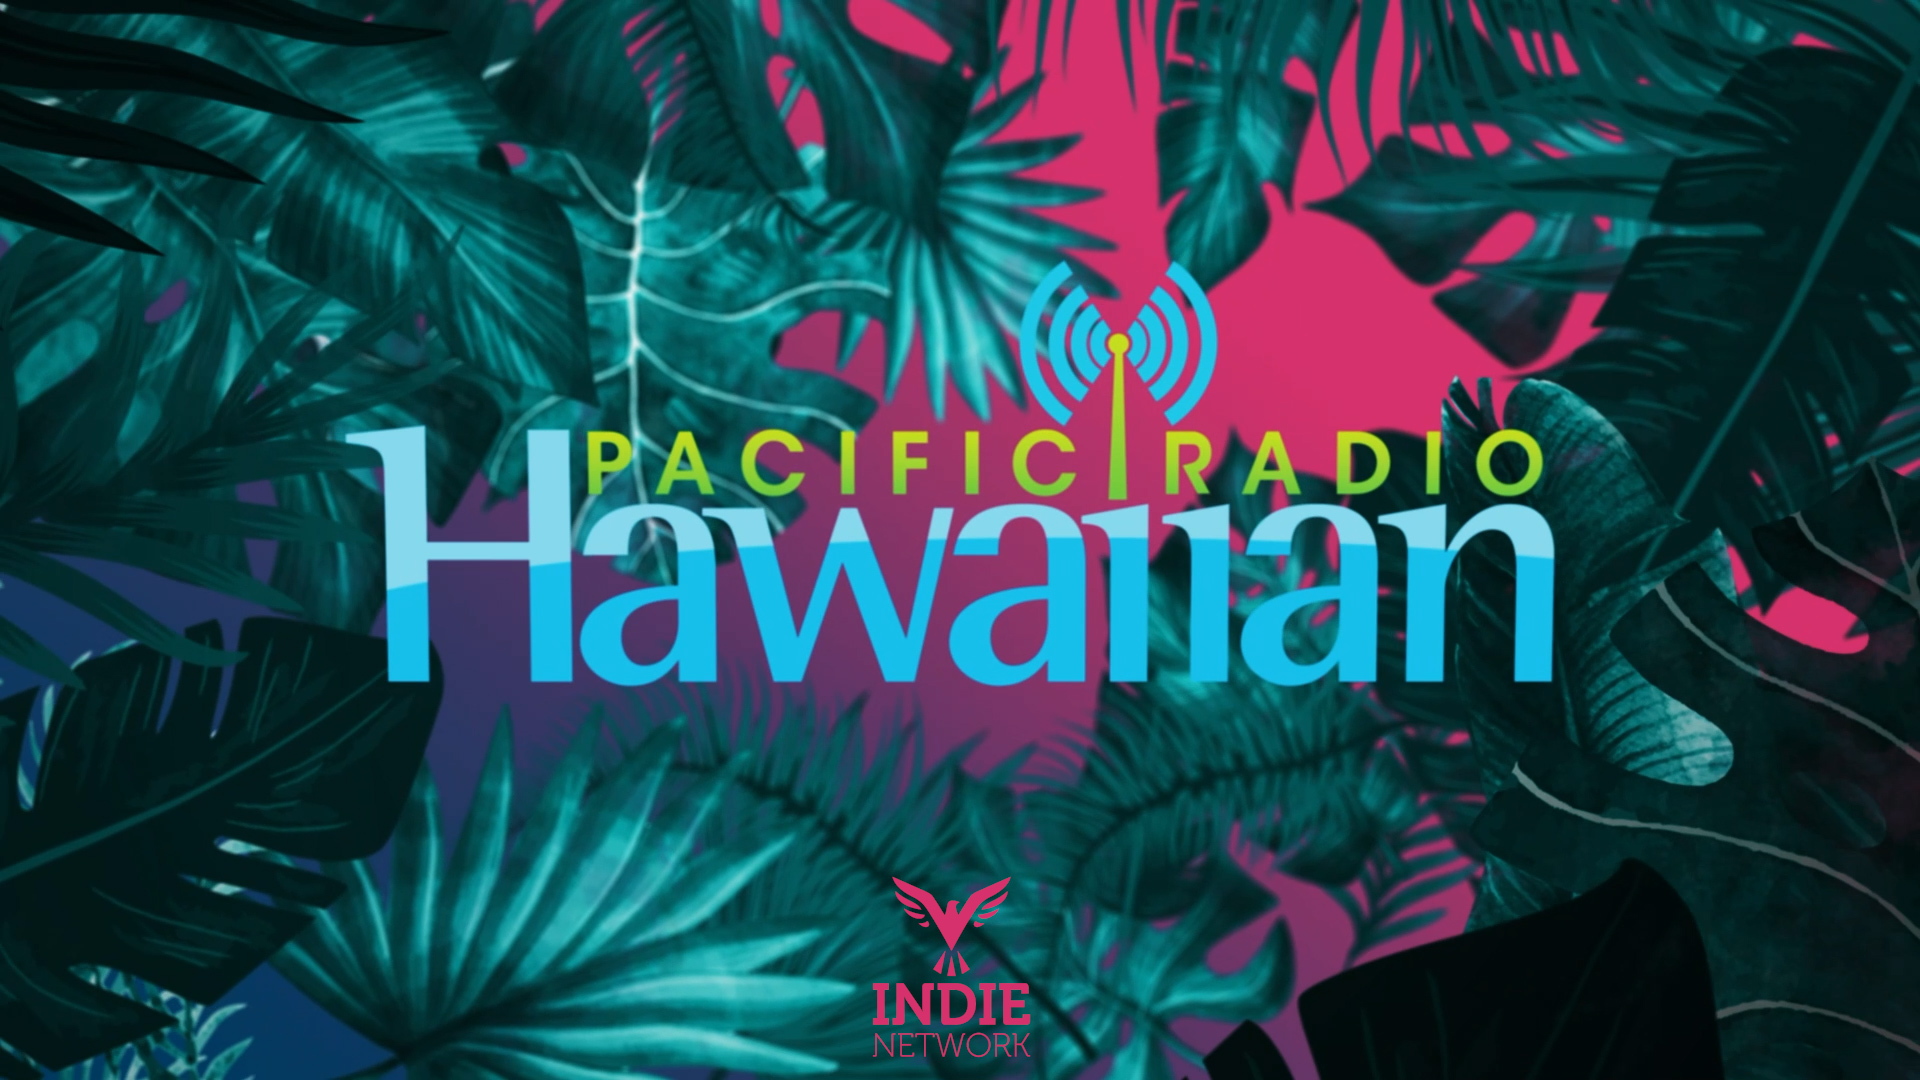 Art for KOGY 95 Hawaiian Imager 2 by Hawaiian Pacific Radio IMAGER 2